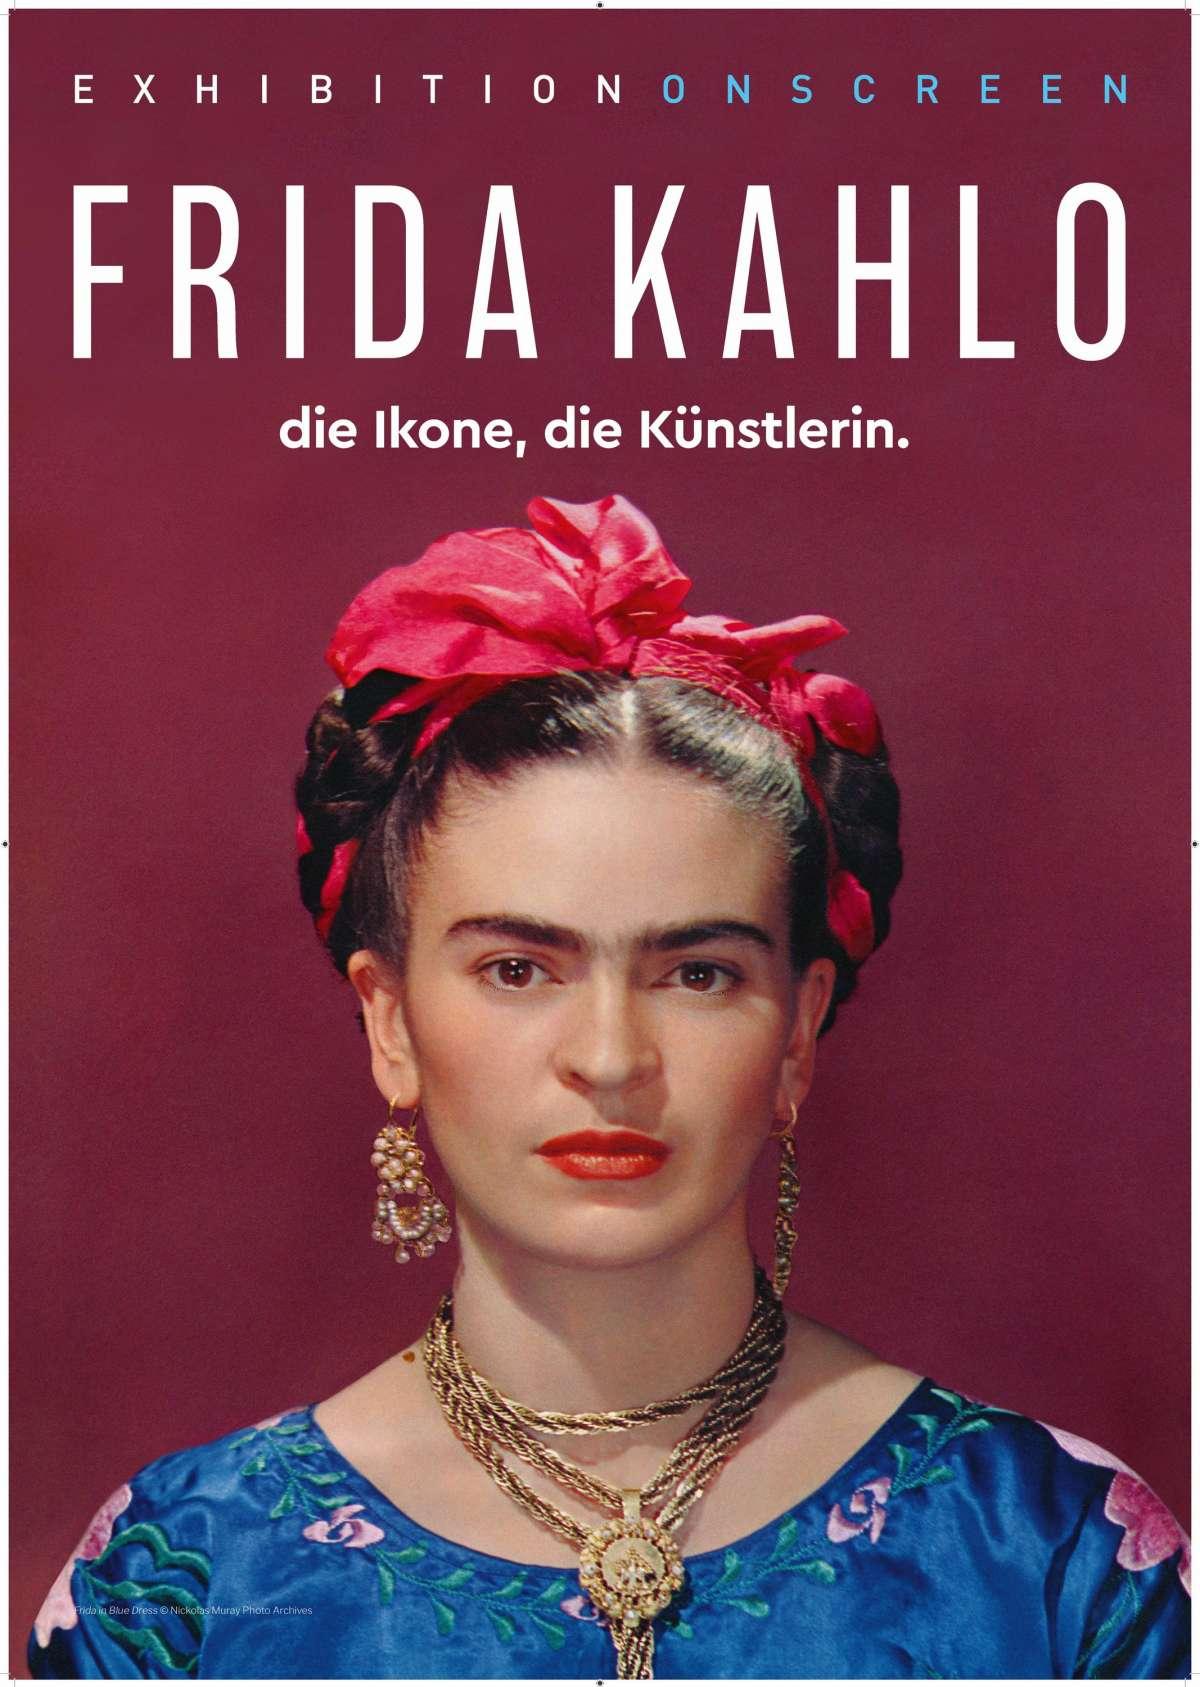 Kunst im Kino: Frida Kahlo - Cine-Royal  - Fritzlar